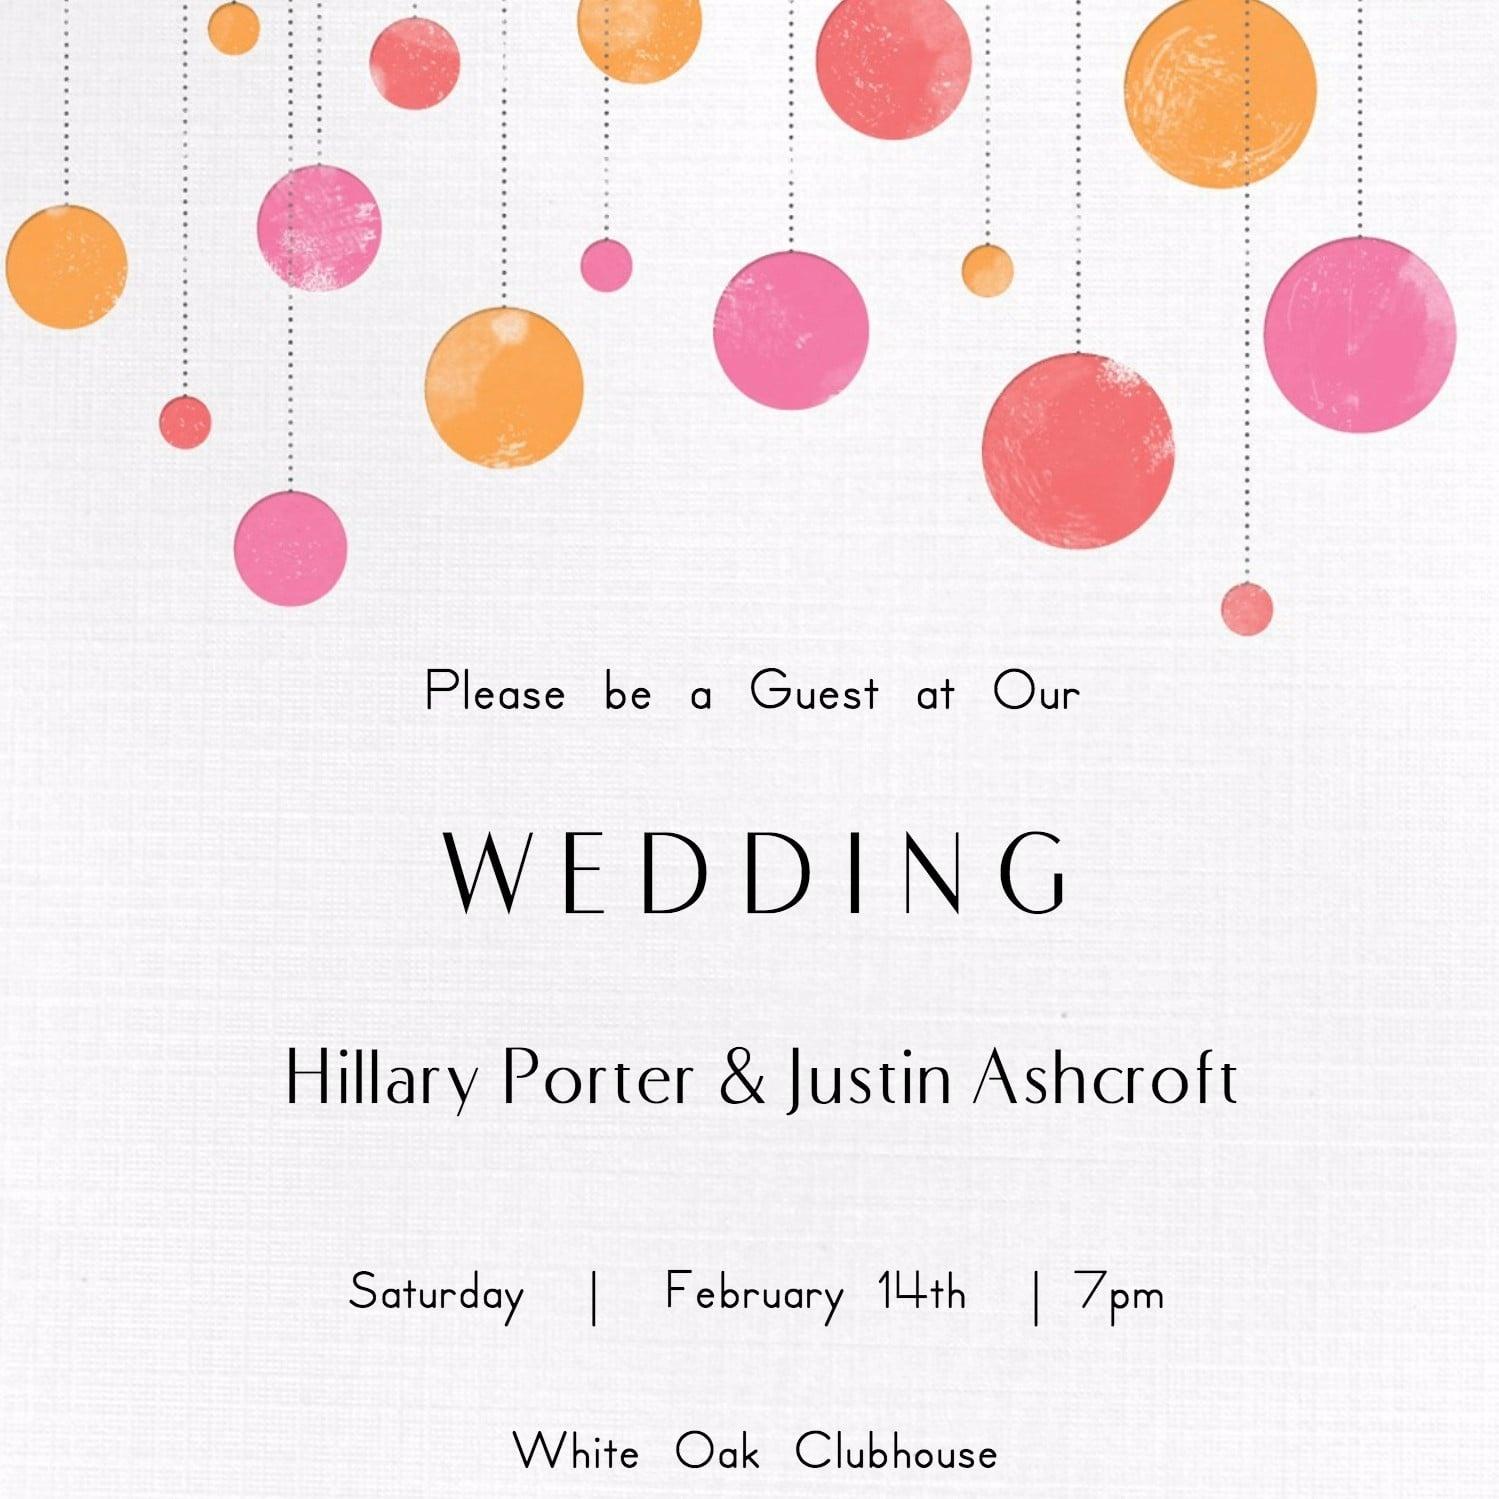 Free Printable Wedding Invitations   Popsugar Smart Living - Free Printable Wedding Cards